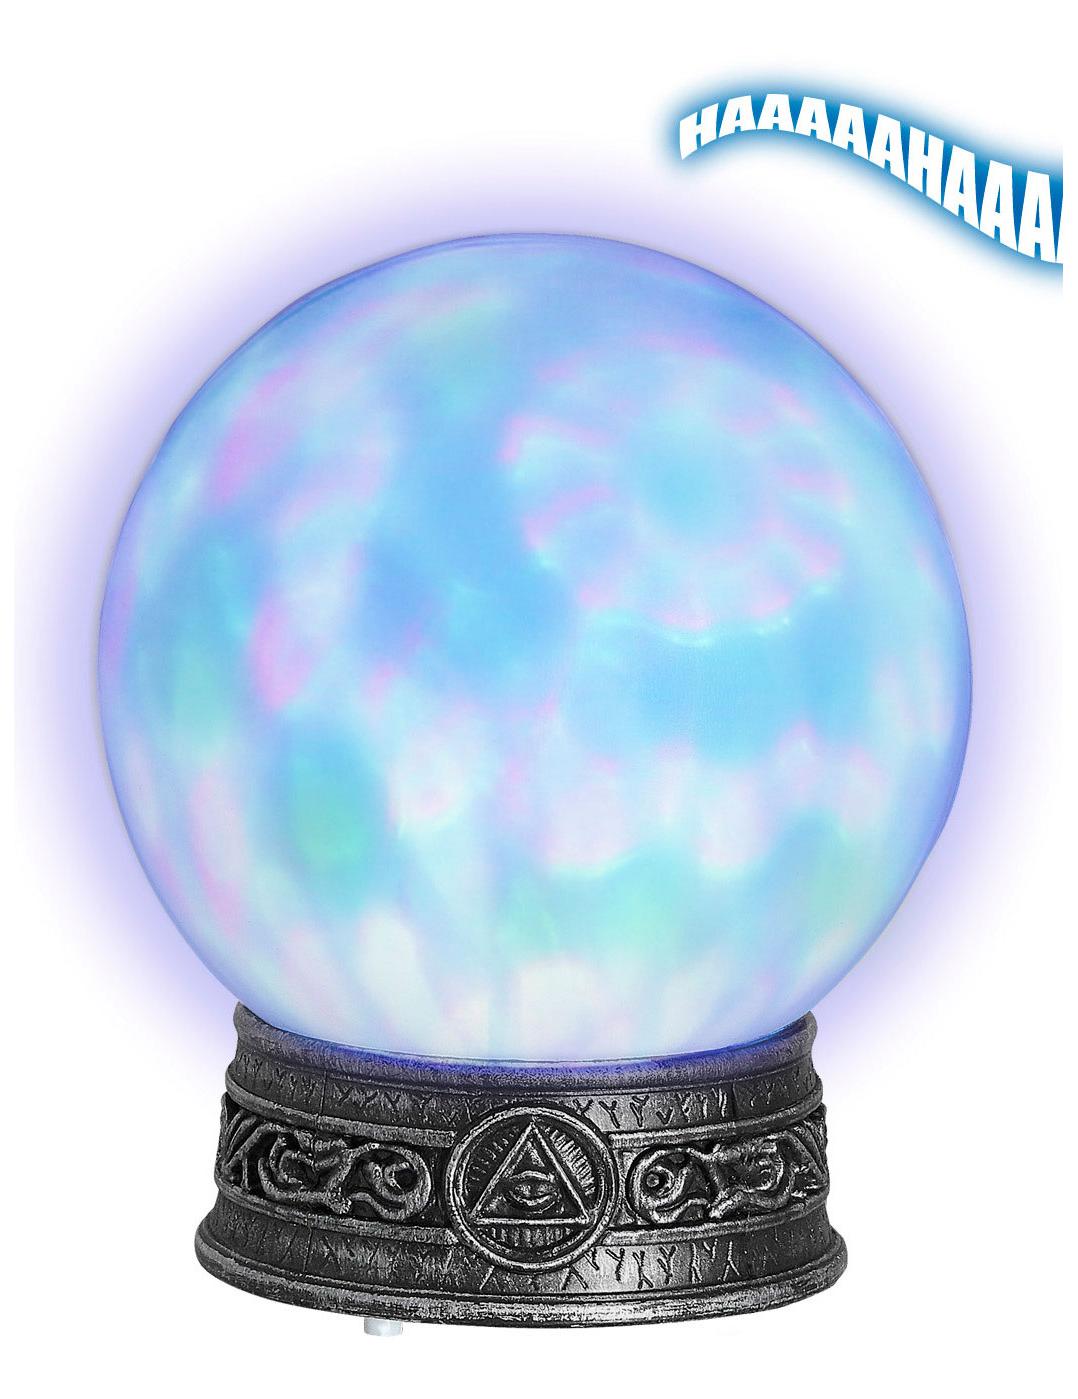 Bola de cristal luminosa Decoraciny disfraces